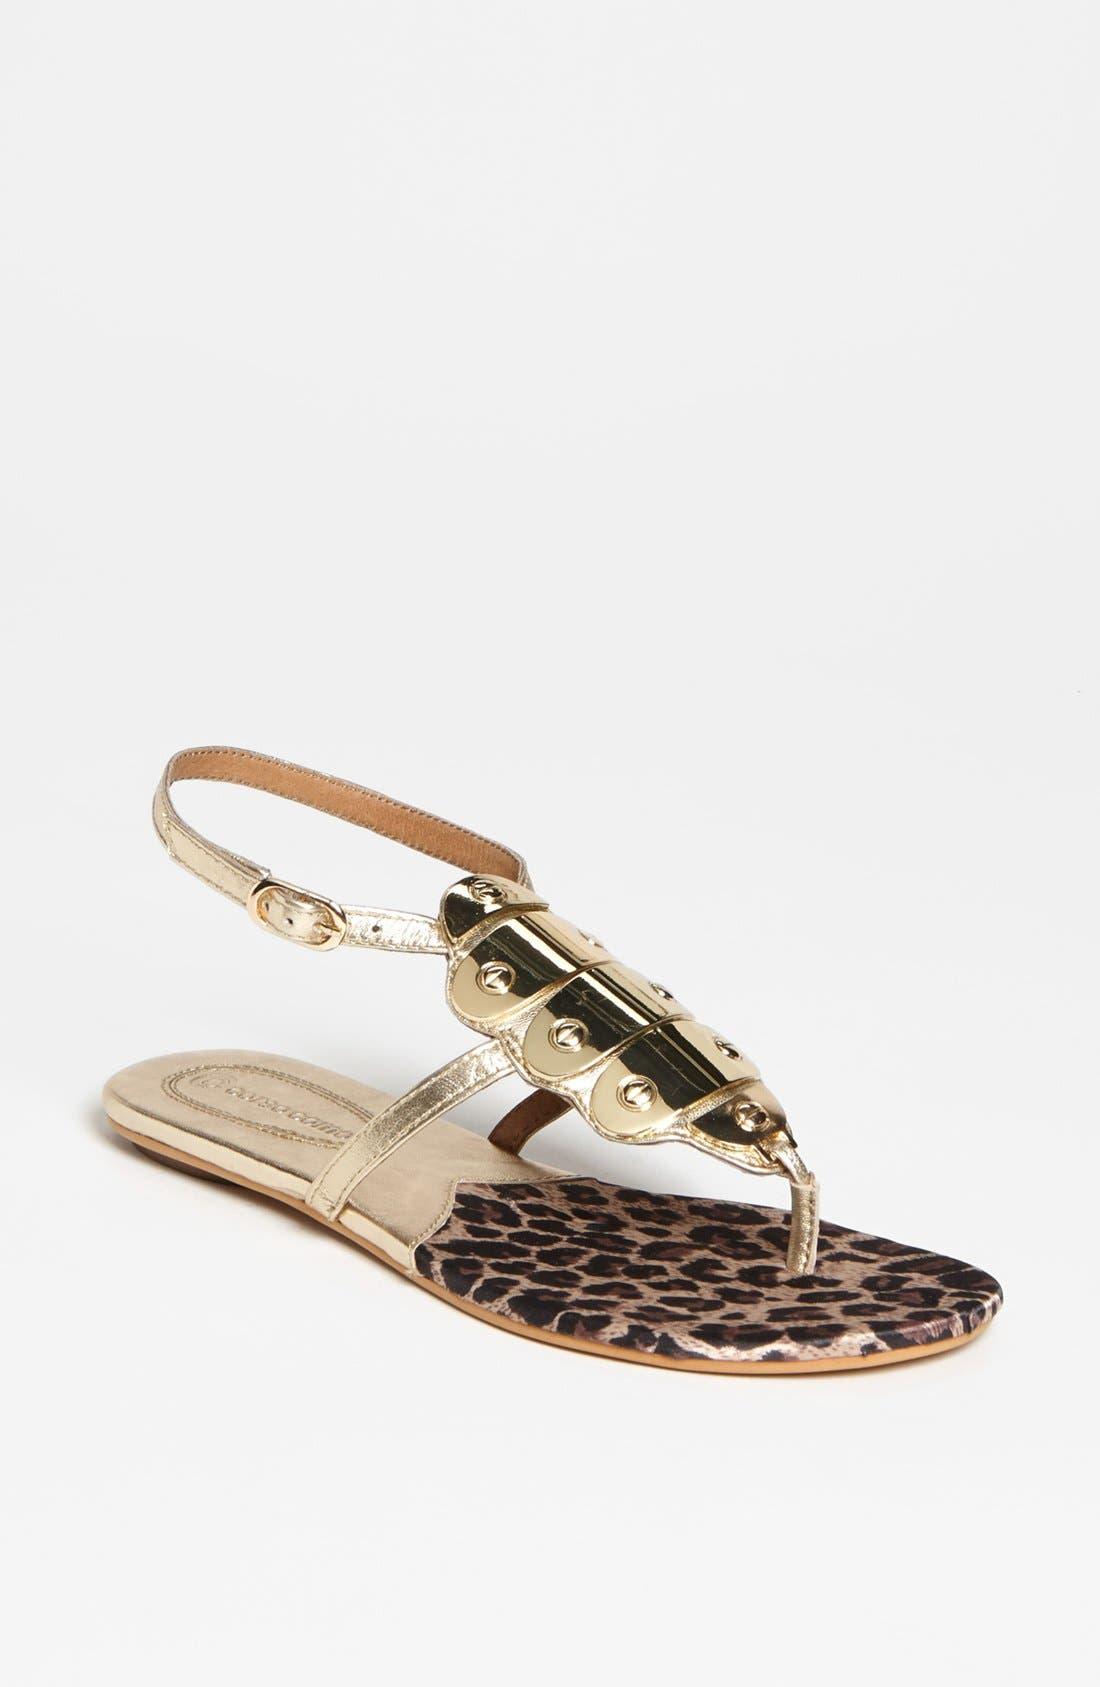 Main Image - Corso Como 'Delfim' Sandal